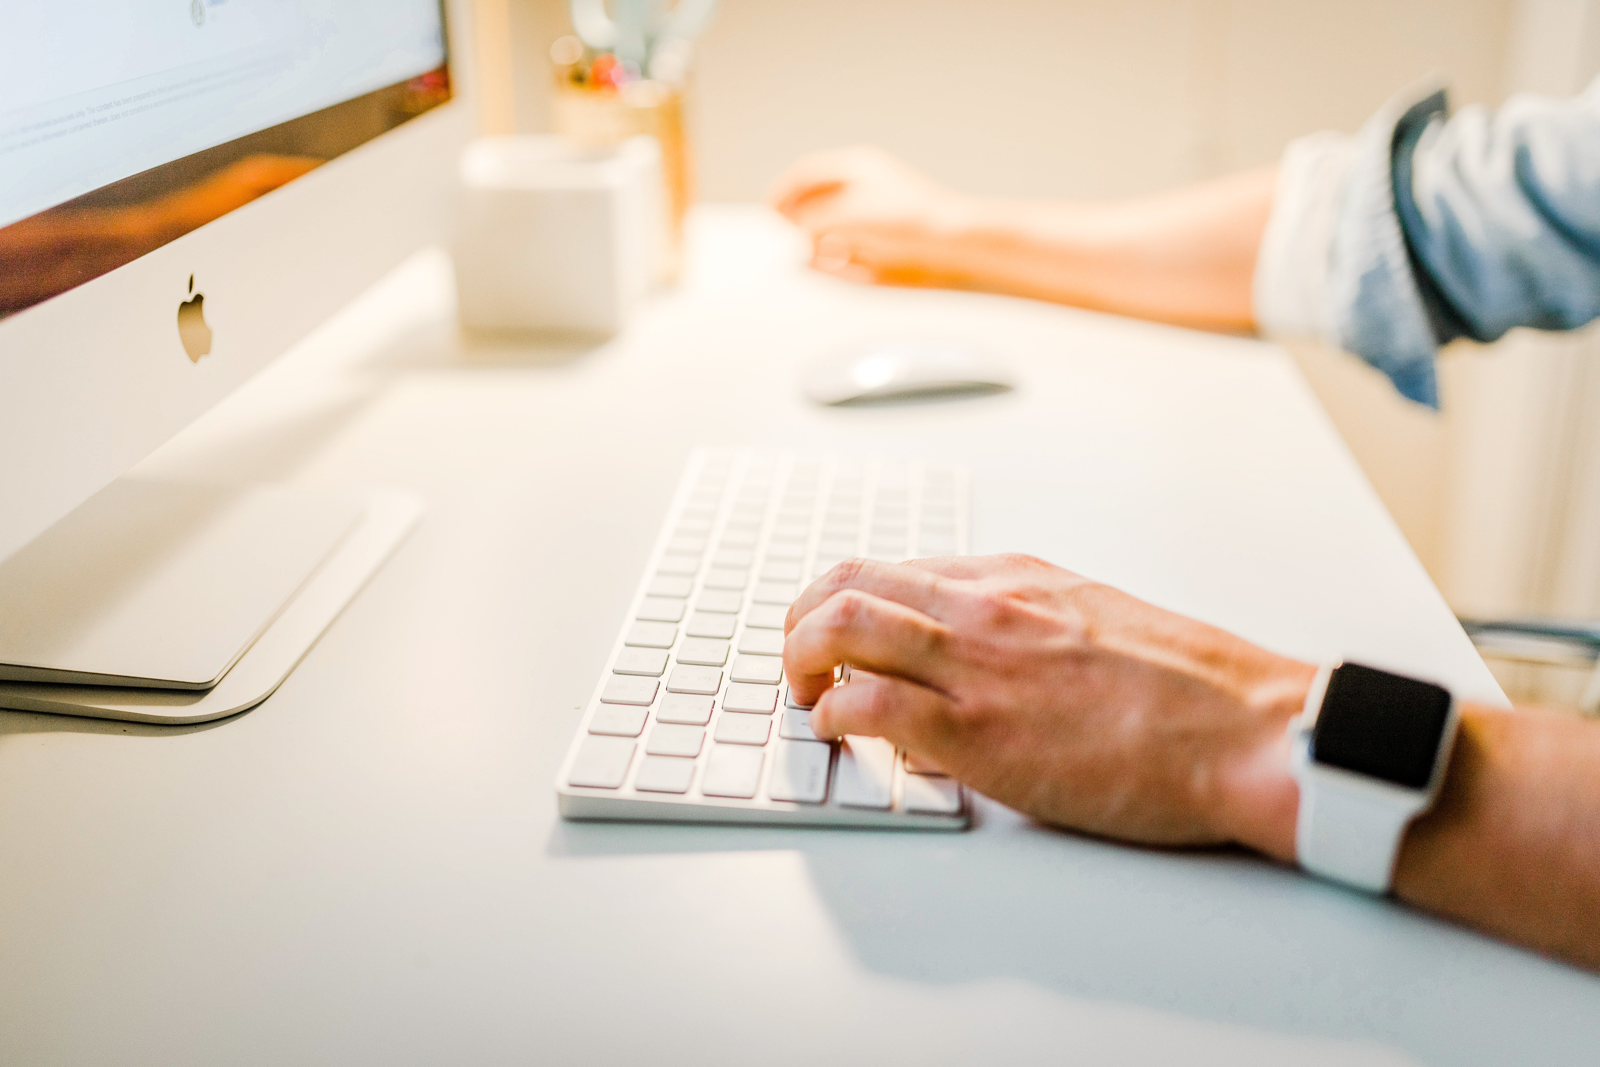 formations marketing digital proposées par c com'créa